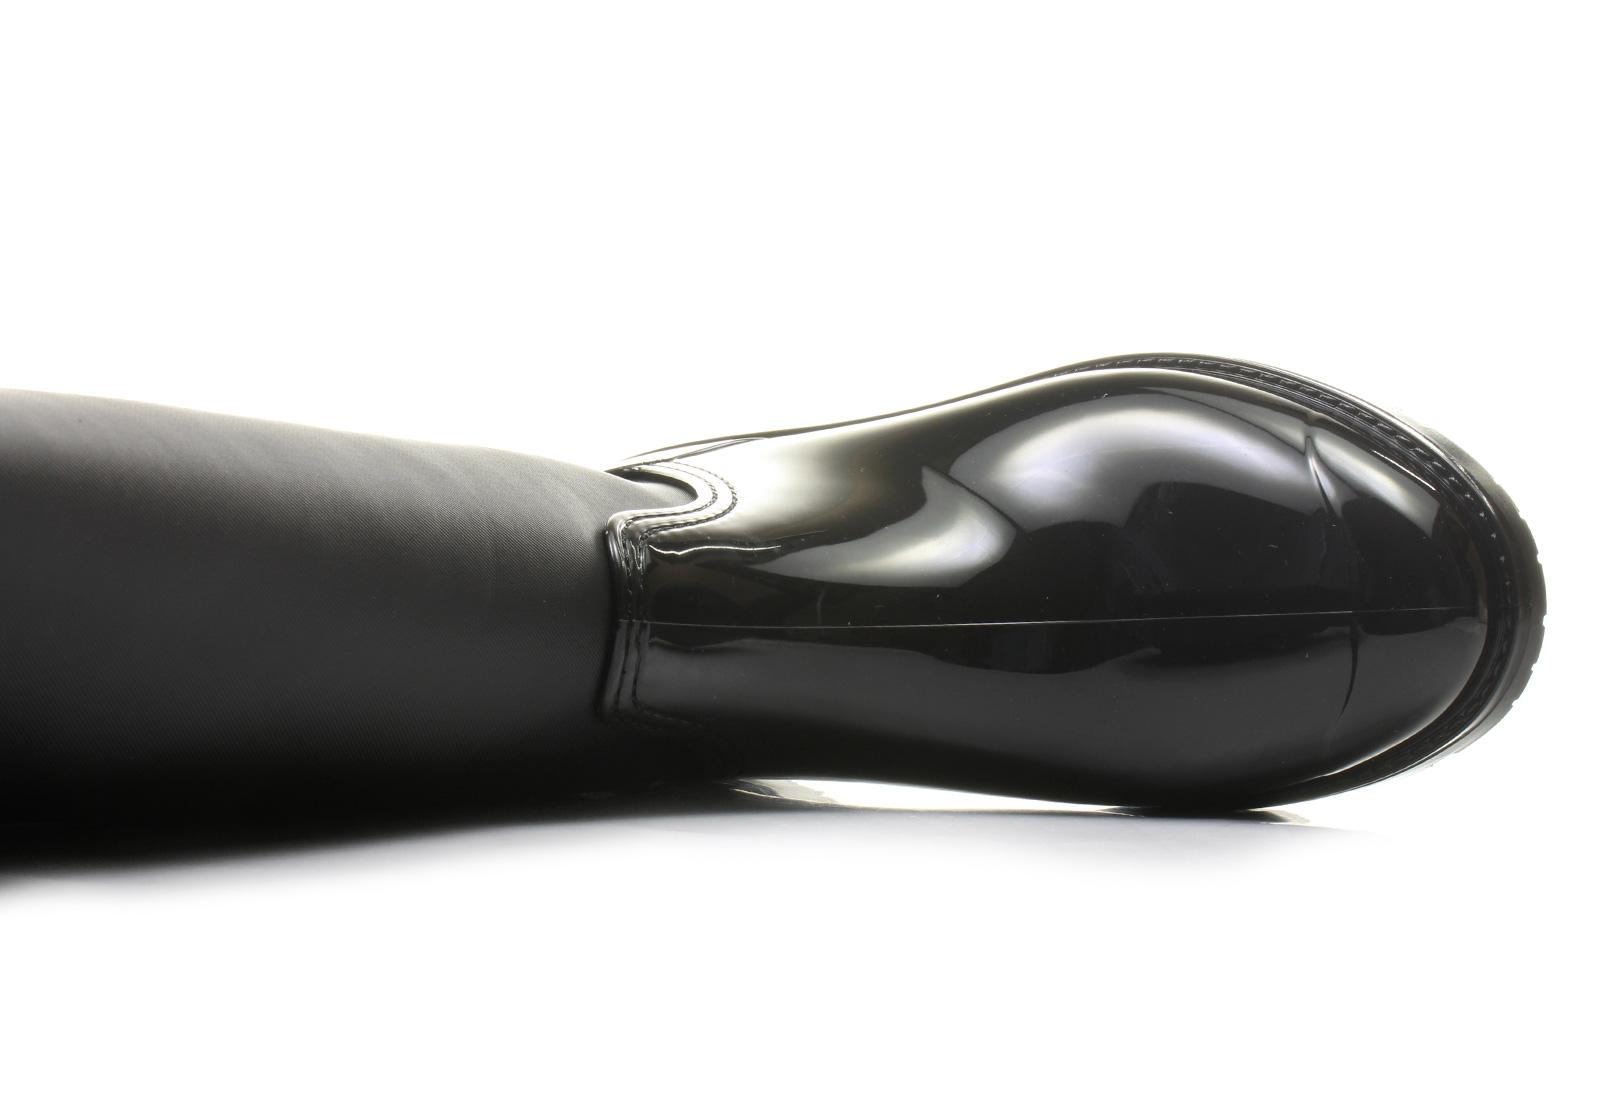 Tommy Hilfiger Csizma - Oxford 19c - 15F-9932-990 - Office Shoes ... 3cc03a1fe9